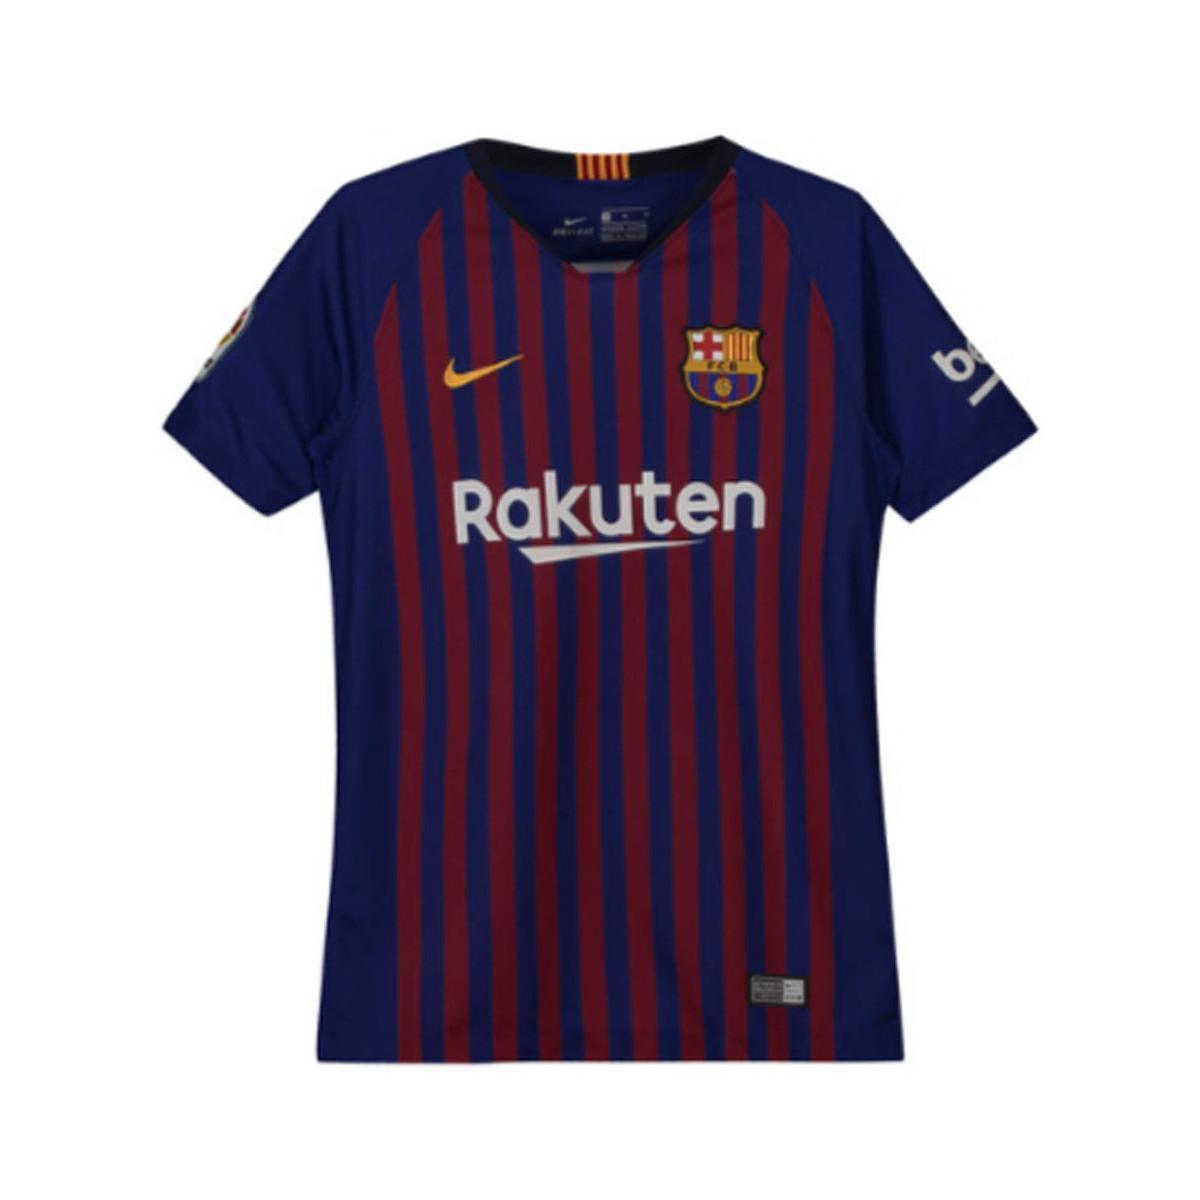 4d0d8121a Nike 2018-2019 Barcelona Home Football Shirt (sergio 5) - Kids ...